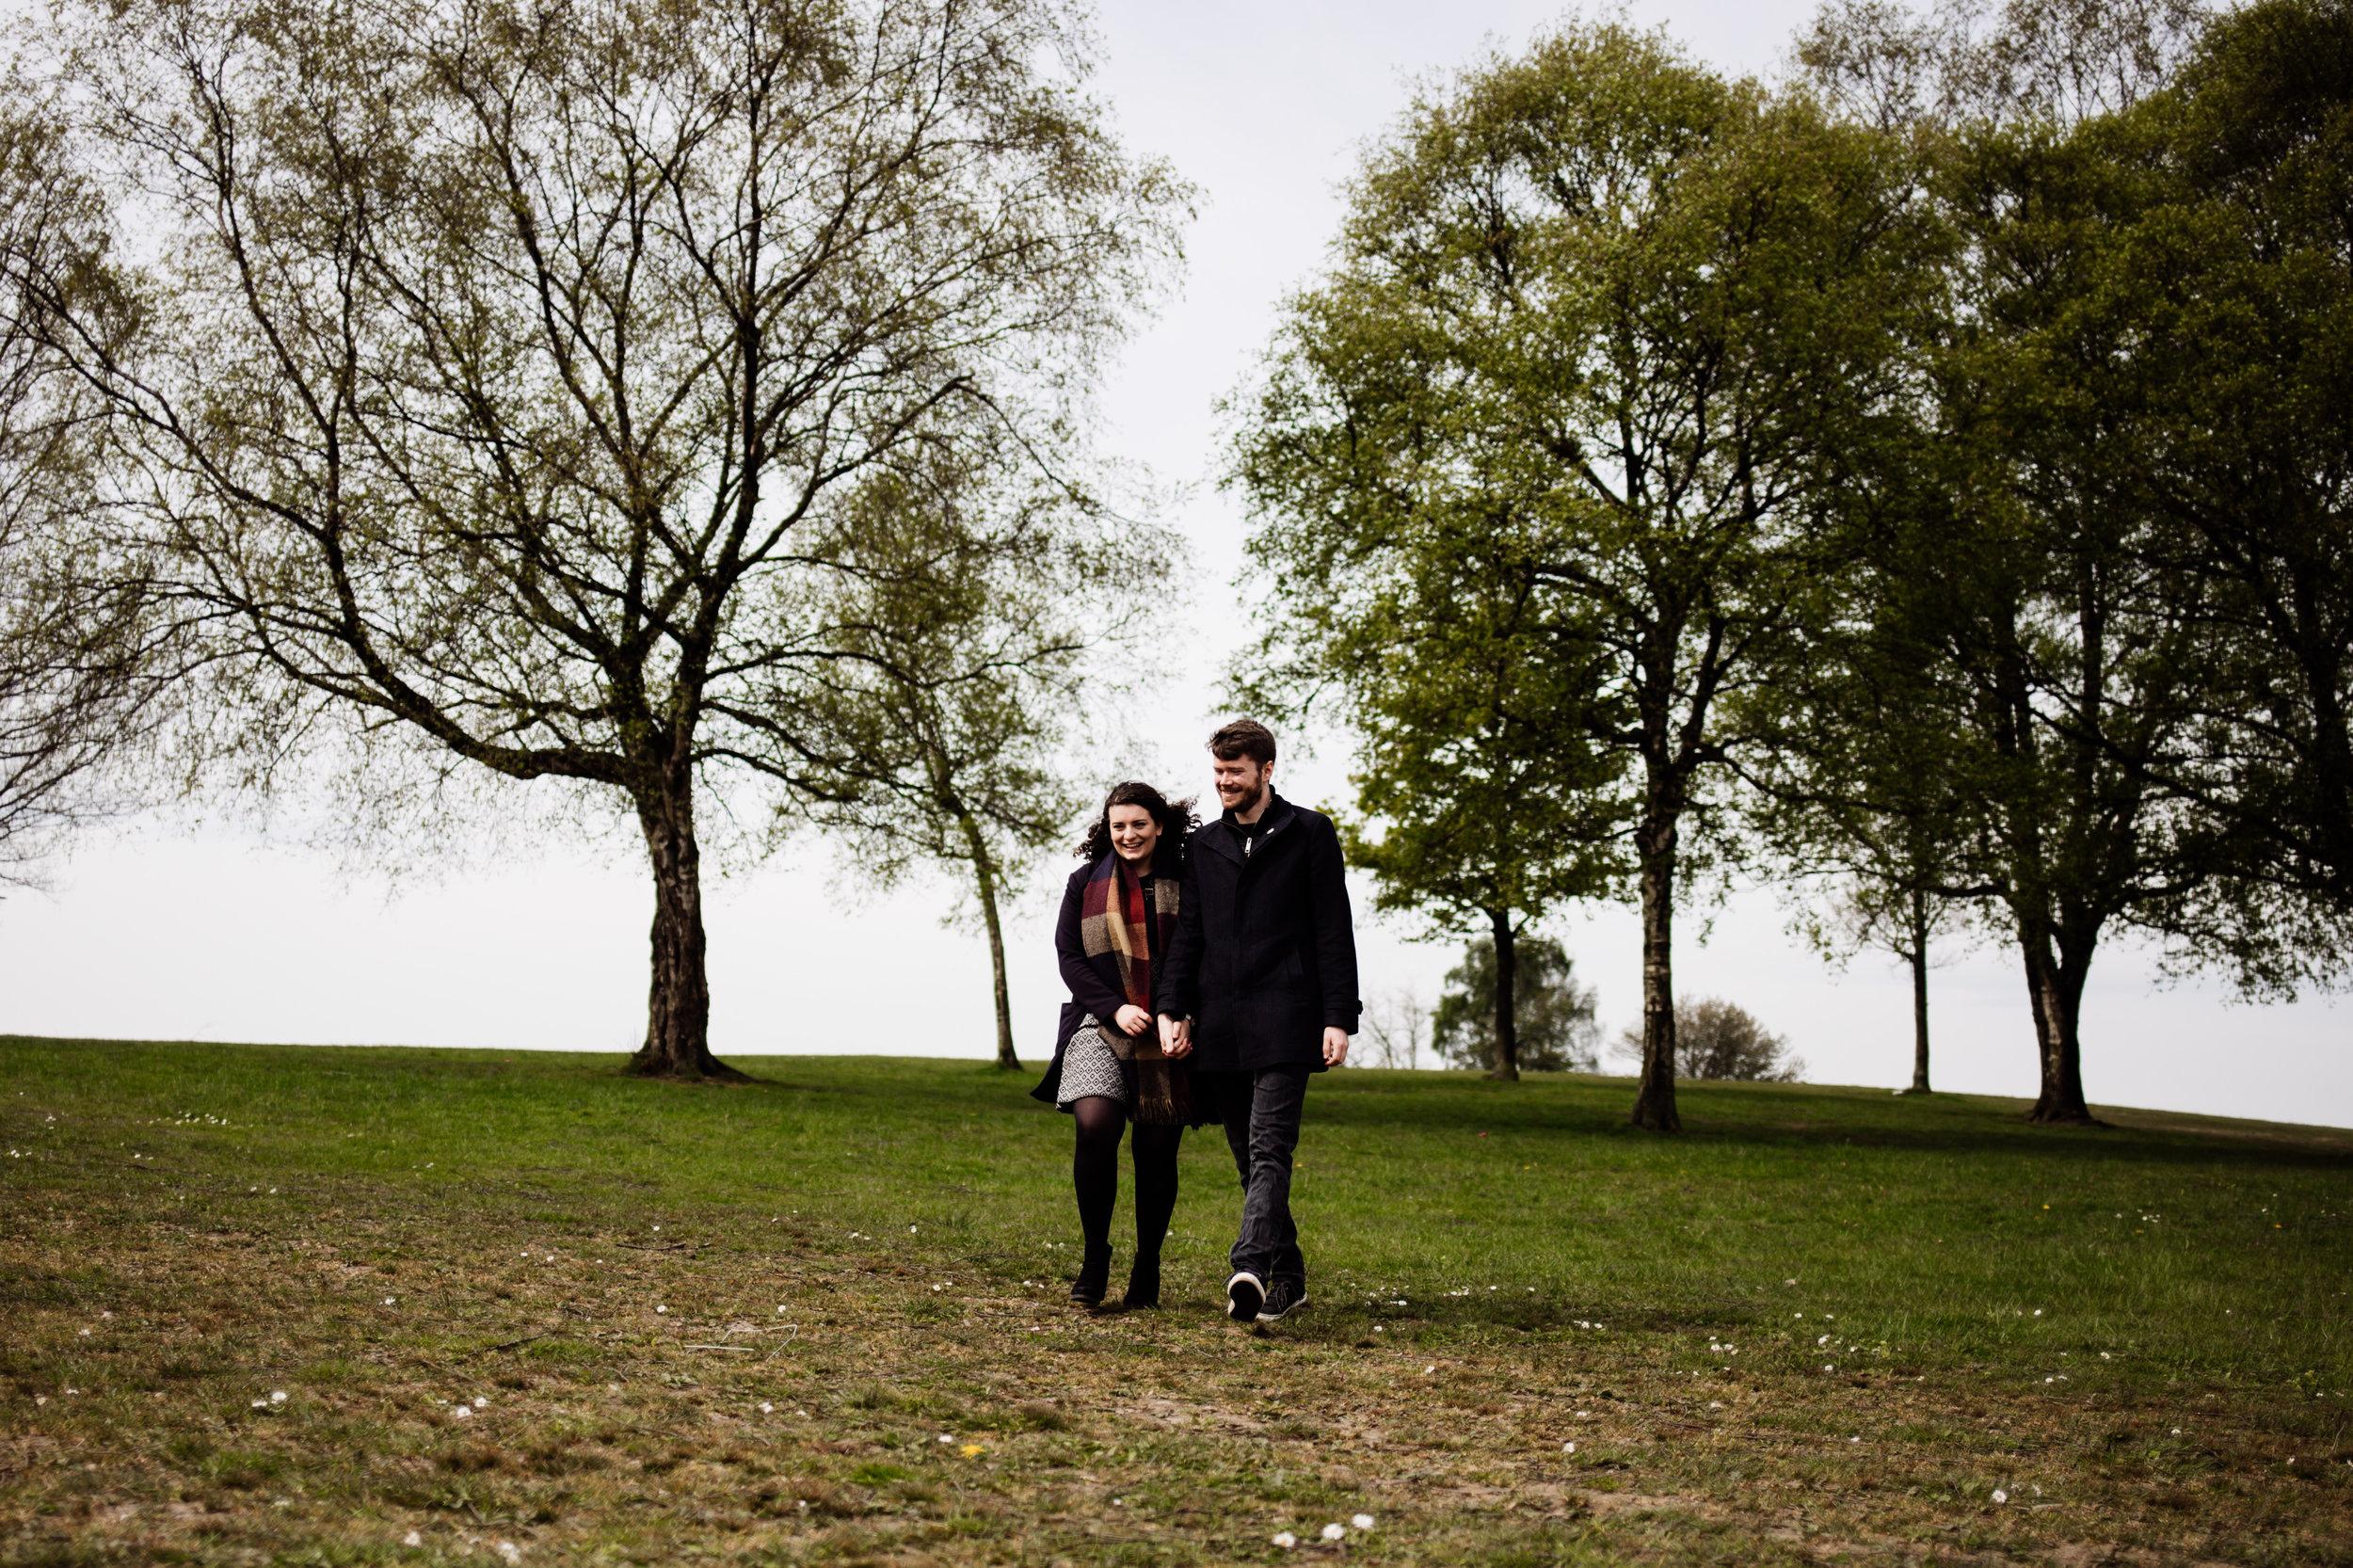 Isobel-and-Daniel-PreWeddingShoot-8.jpg